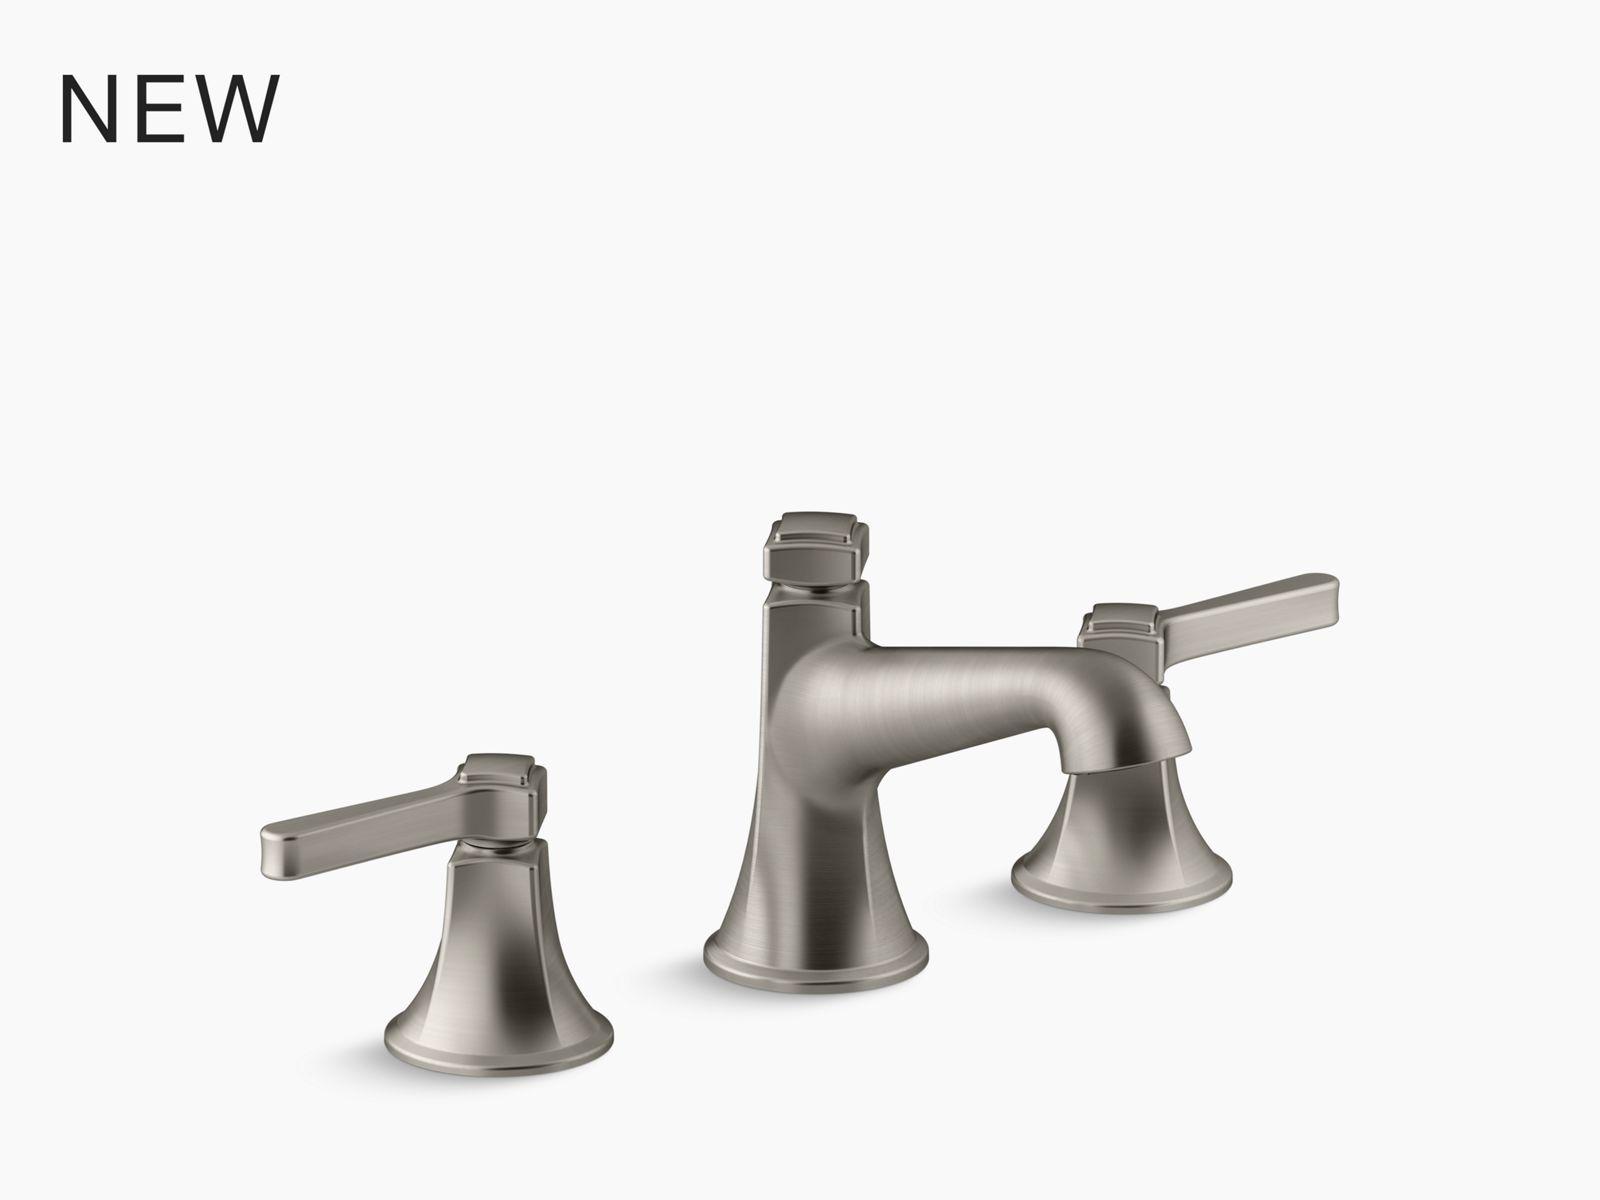 ladena 20 7 8 x 14 3 8 x 8 1 8 undermount bathroom sink